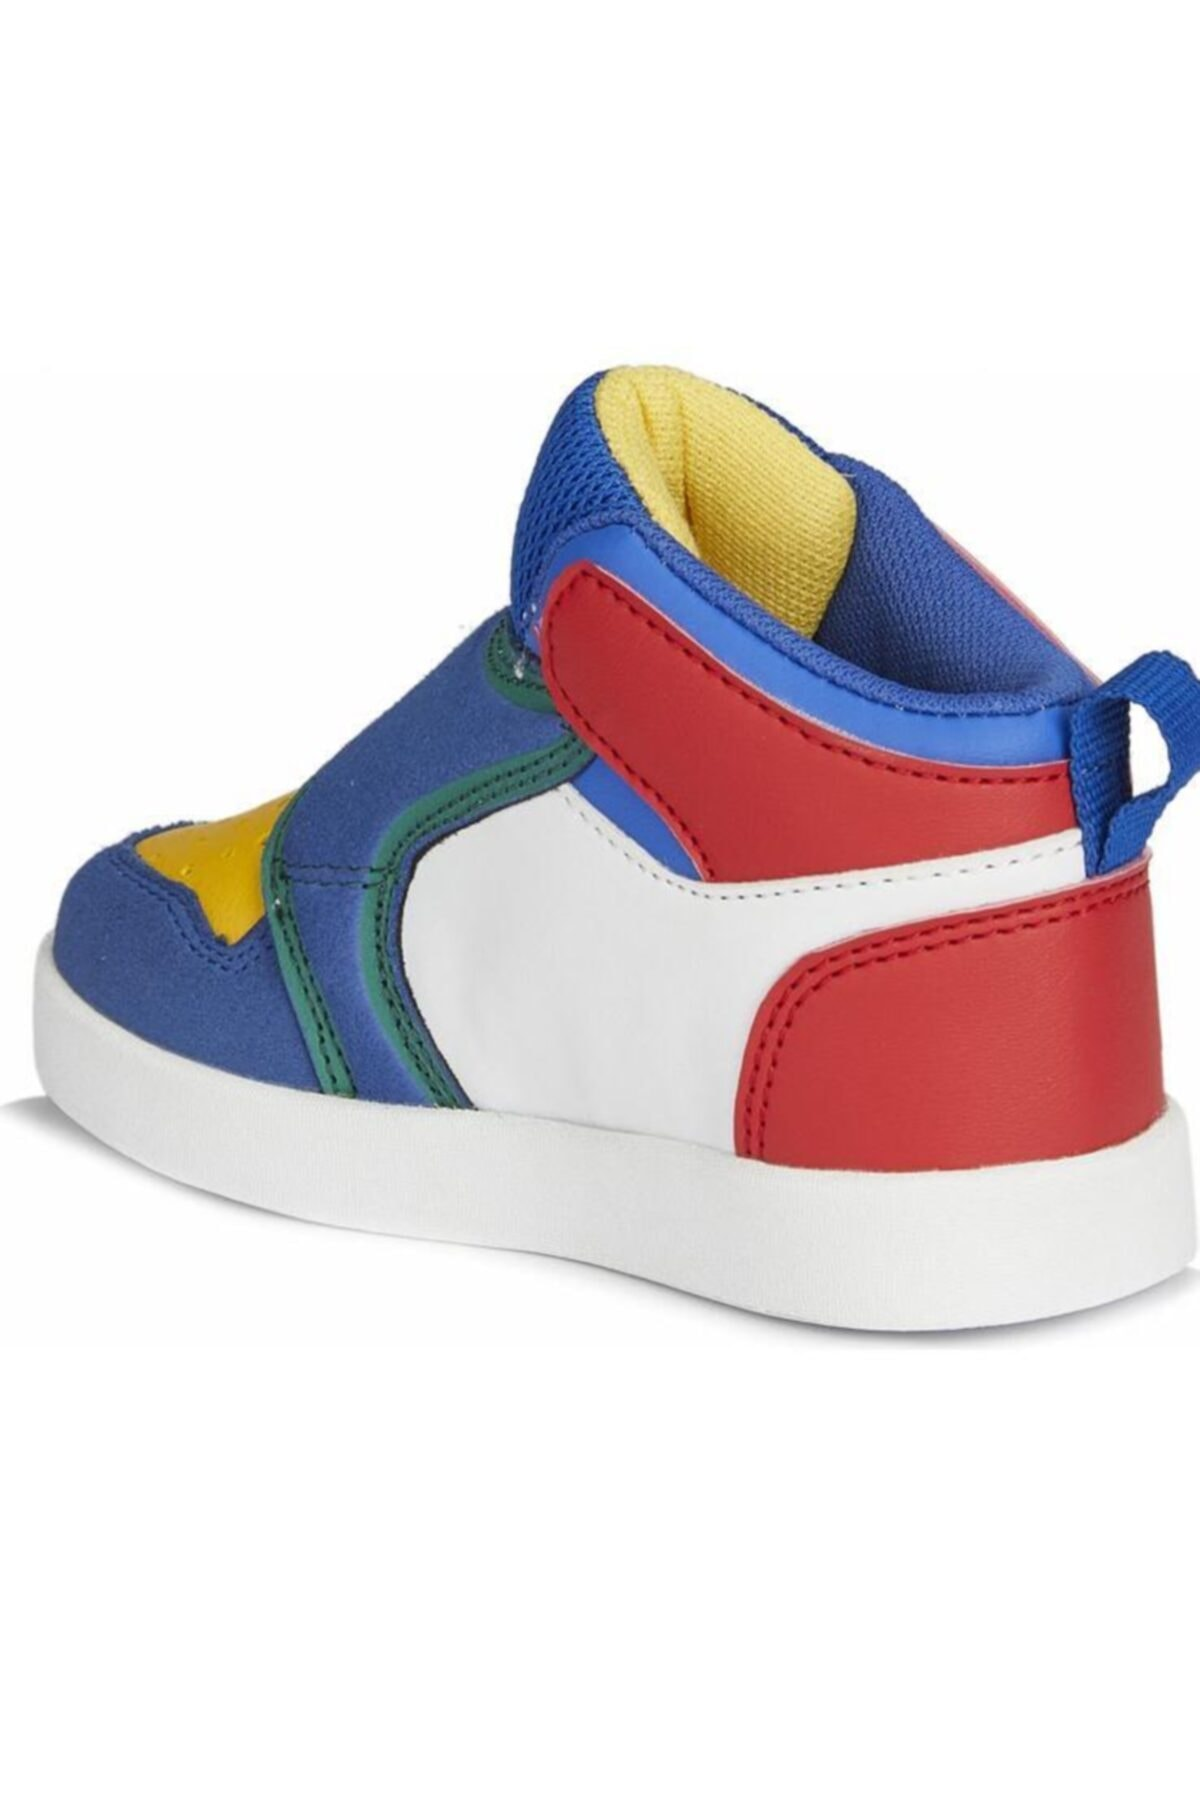 Vicco Mega Ayakkabı 2